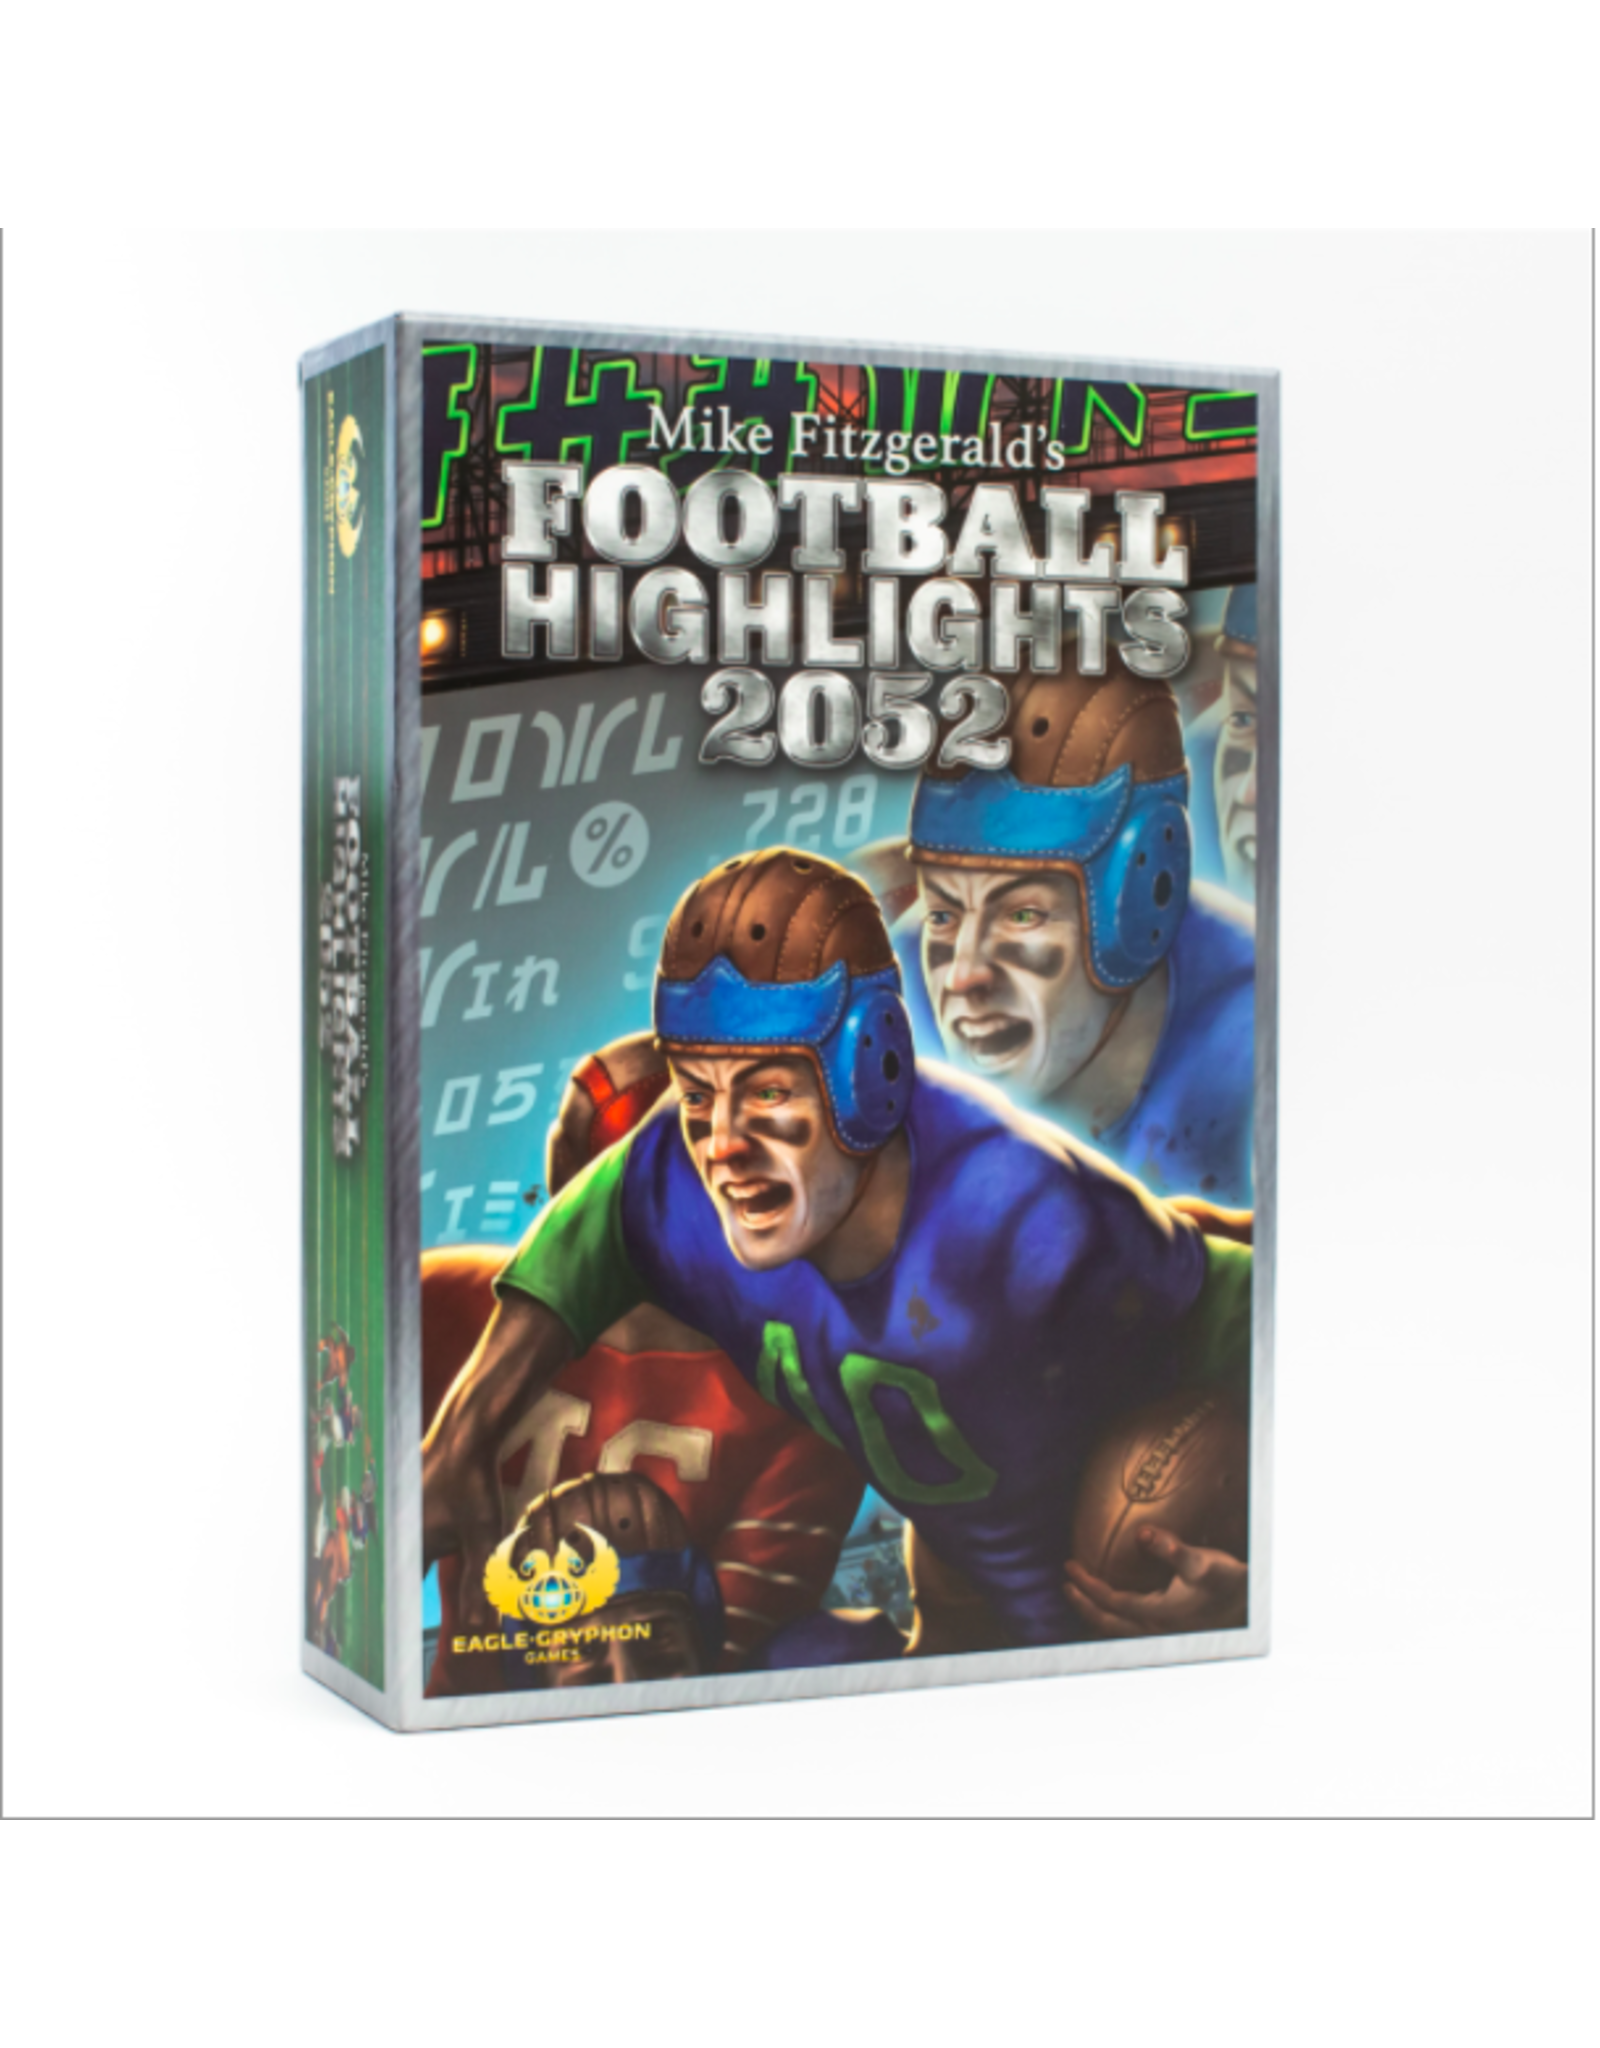 Eagle-Gryphon Games Football Highlights: 2052